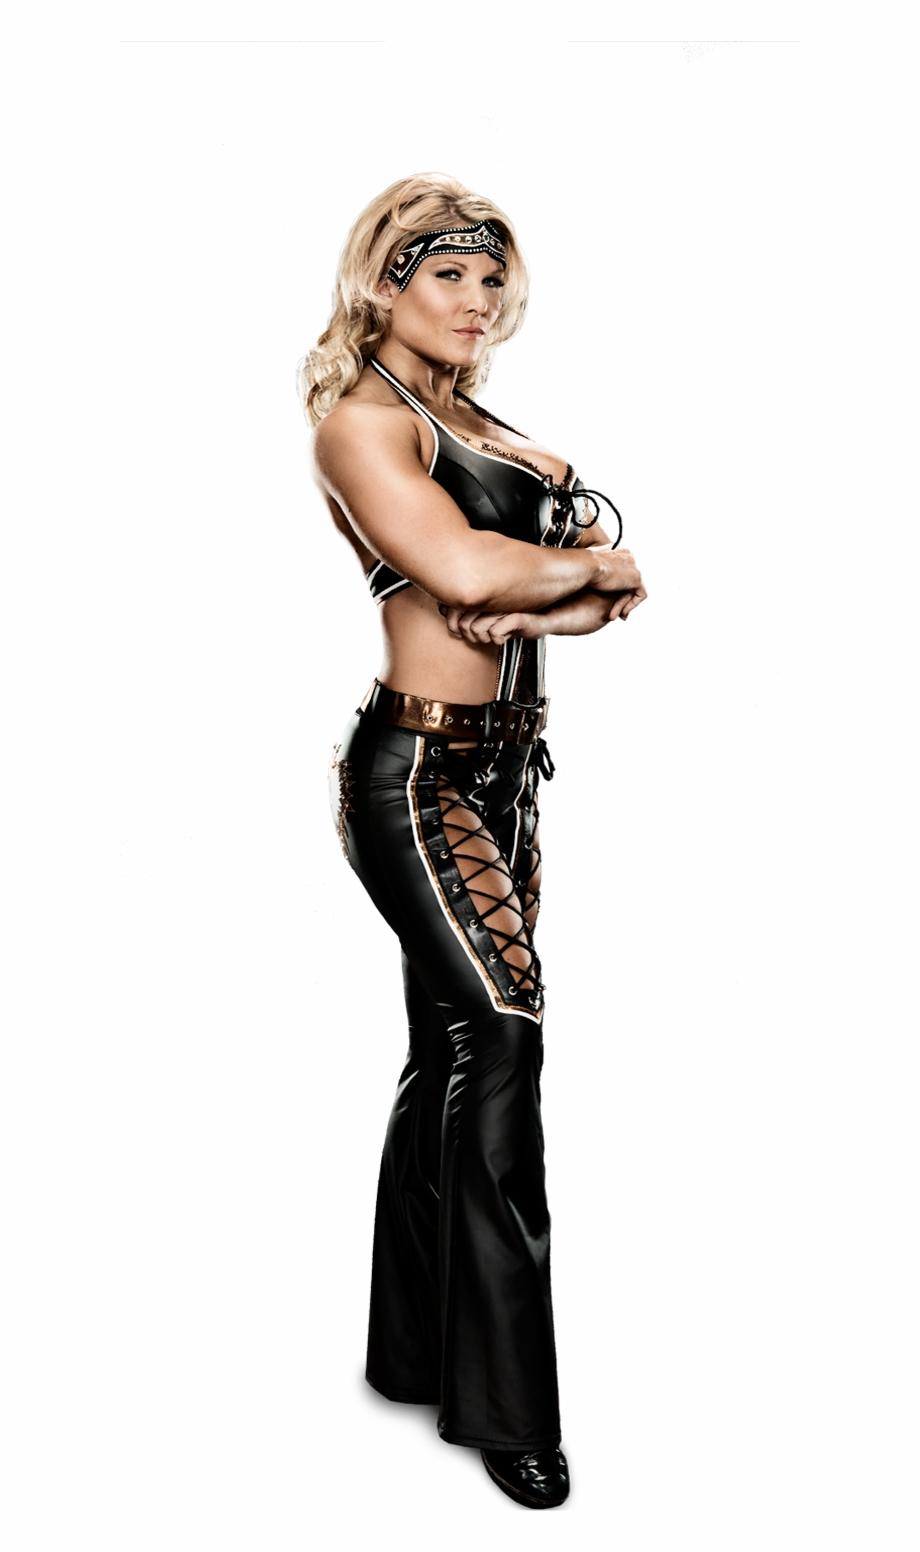 Wwe Diva Beth Phoenix Female Wrestlers, Wwe Wrestlers,.